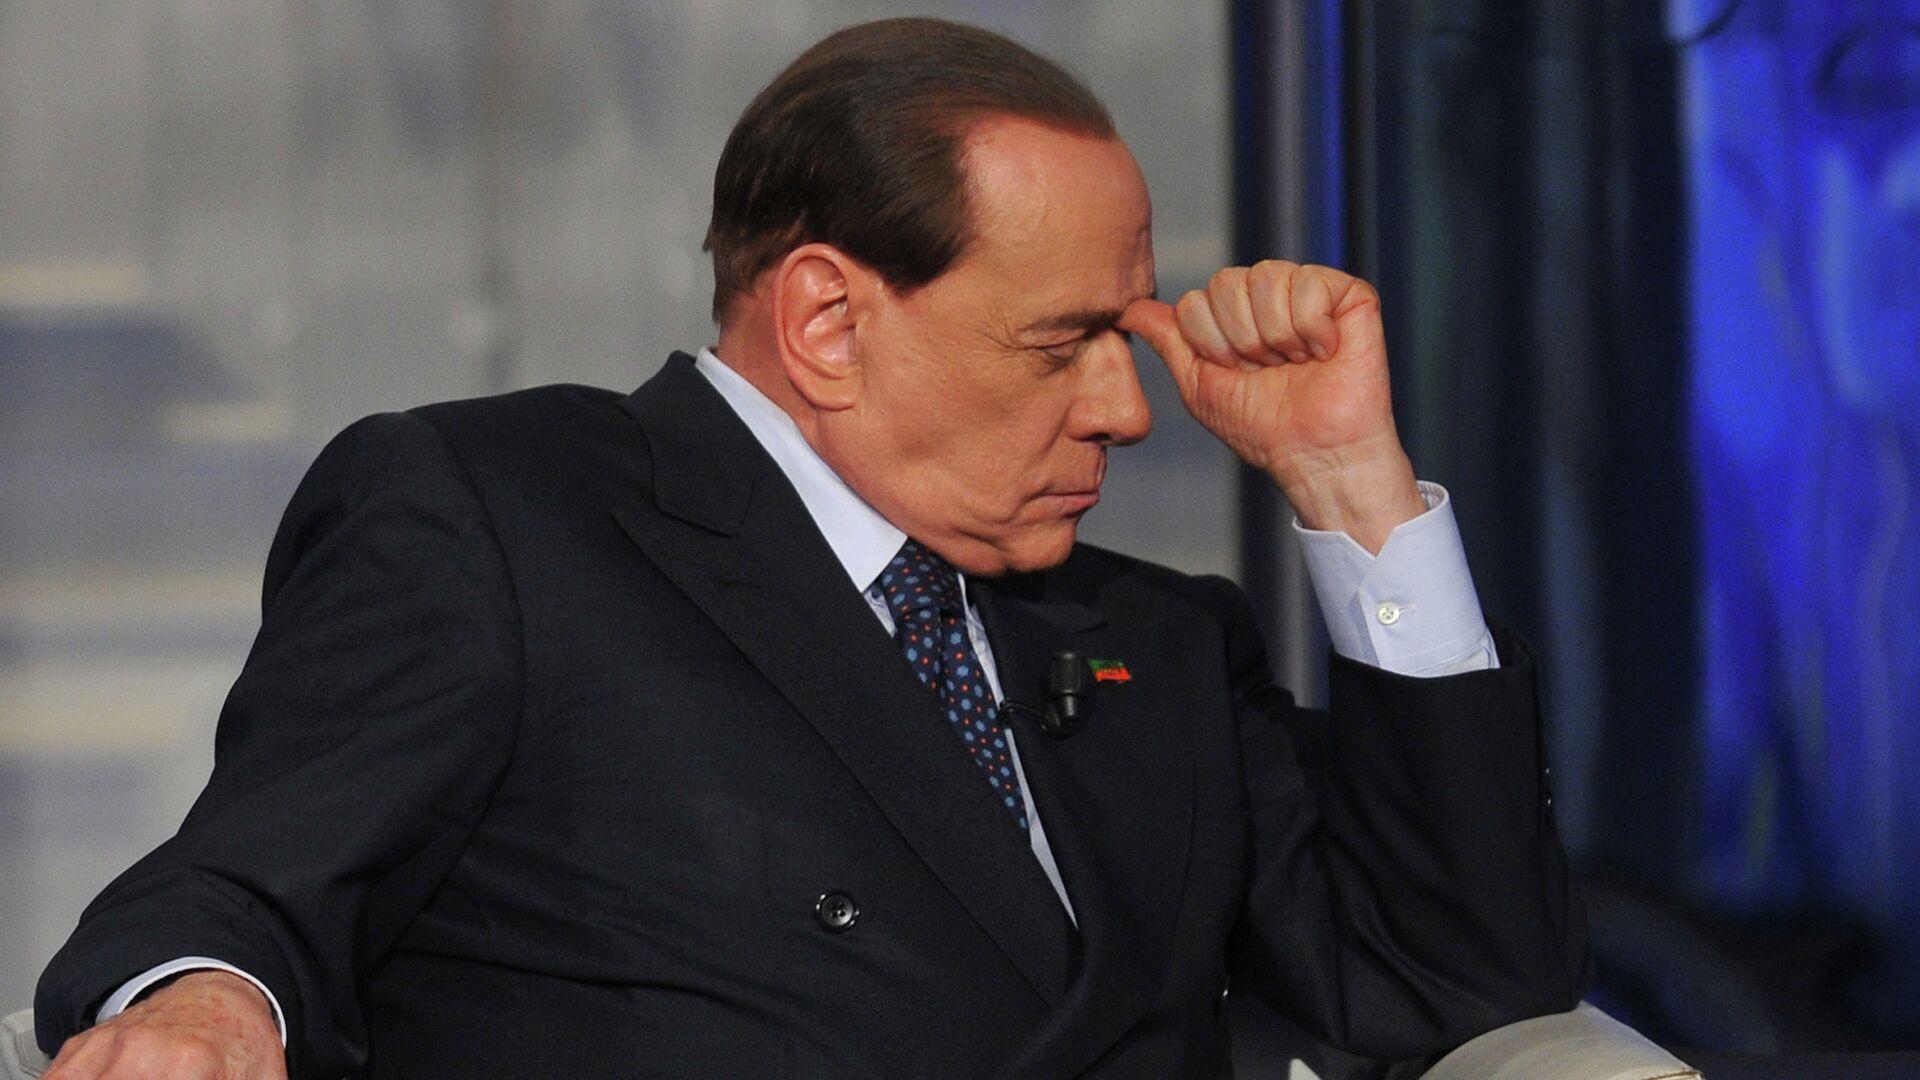 L'ex premier italiano Silvio Berlusconi  - Sputnik Italia, 1920, 31.08.2021